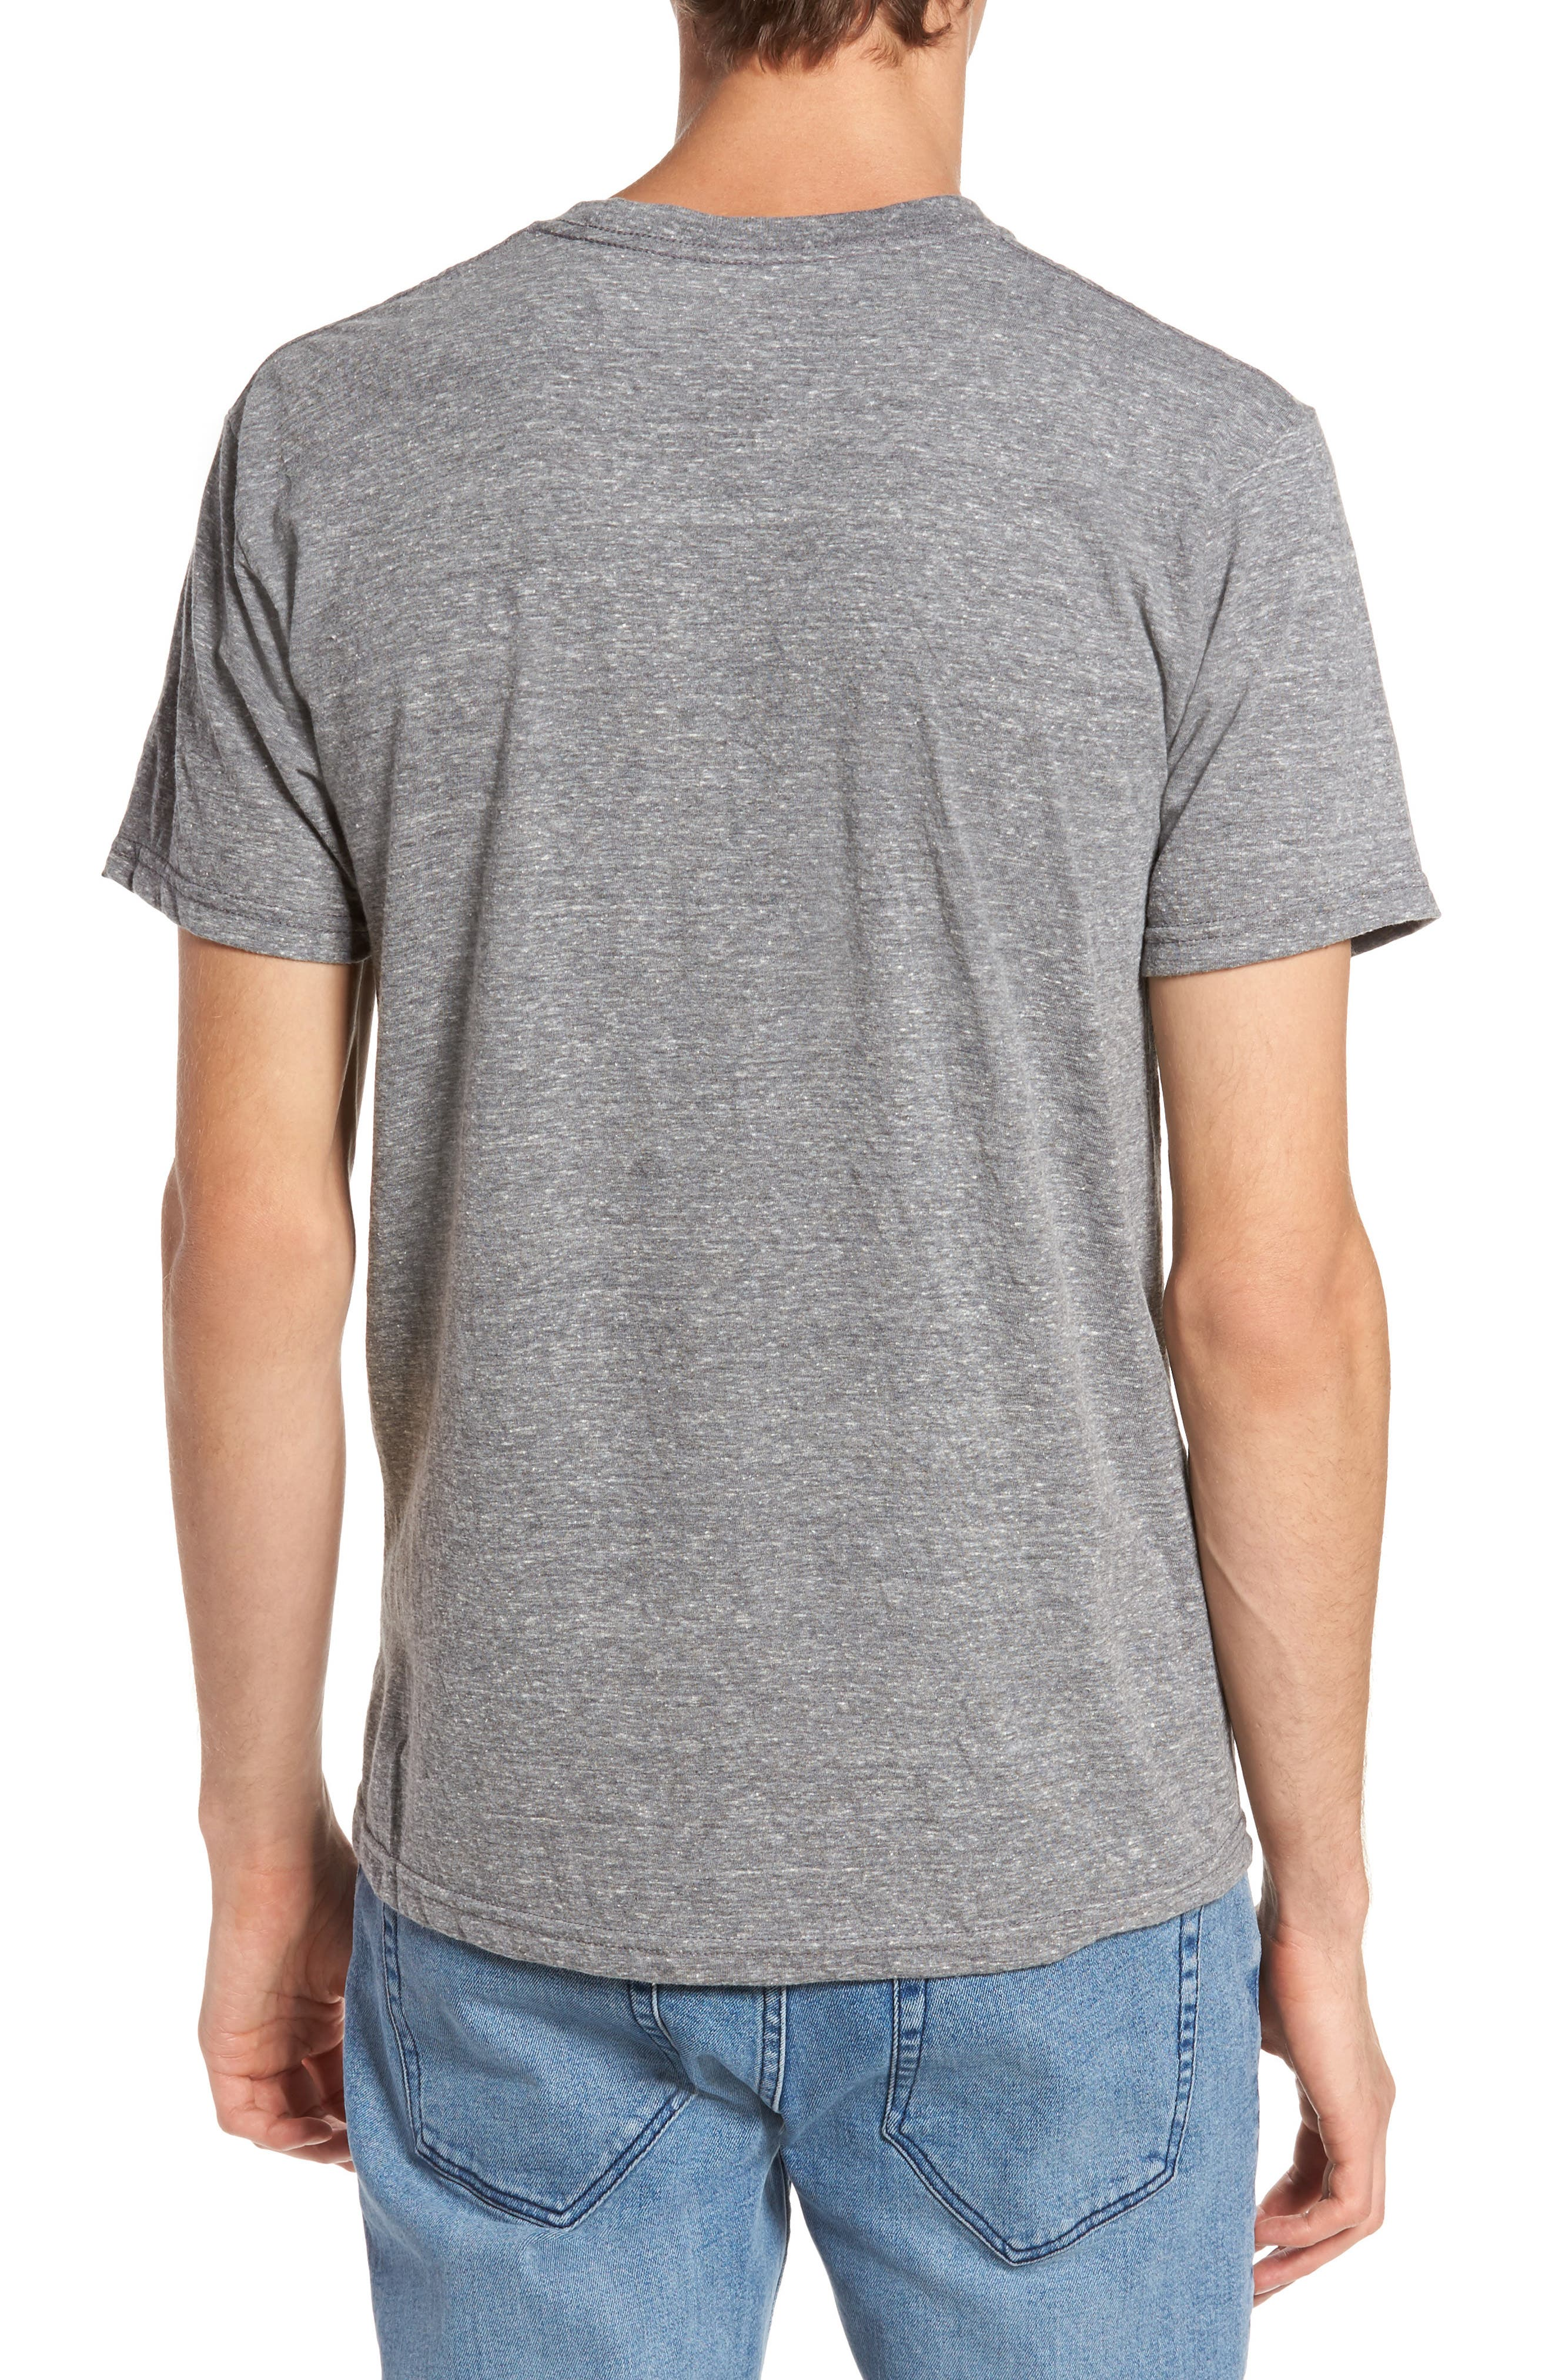 Burning Marshmallows T-Shirt,                             Alternate thumbnail 2, color,                             Triblend Grey